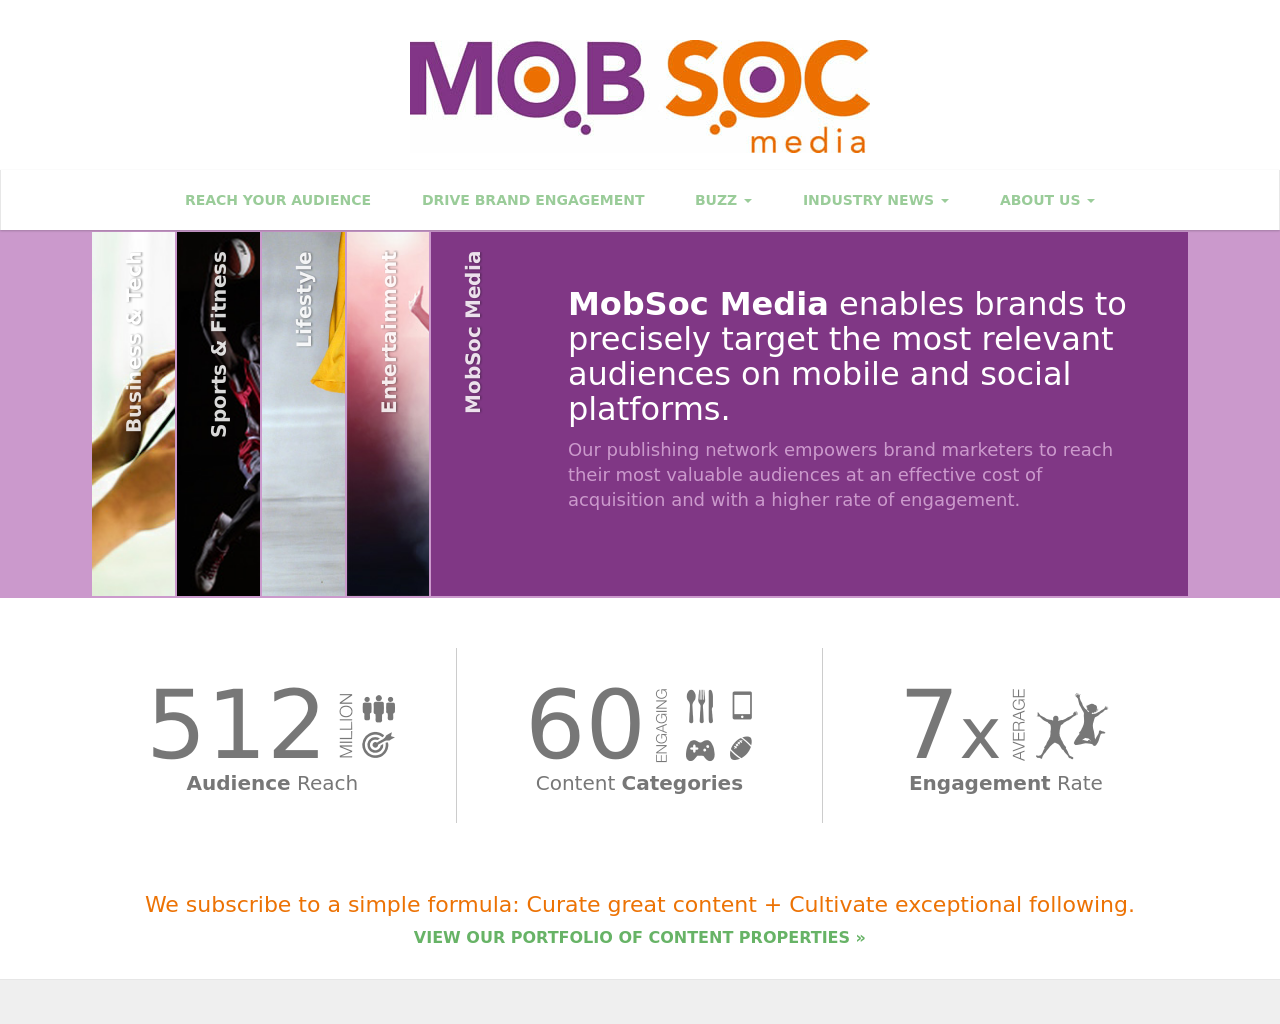 MobSoc-Media-Advertising-Reviews-Pricing